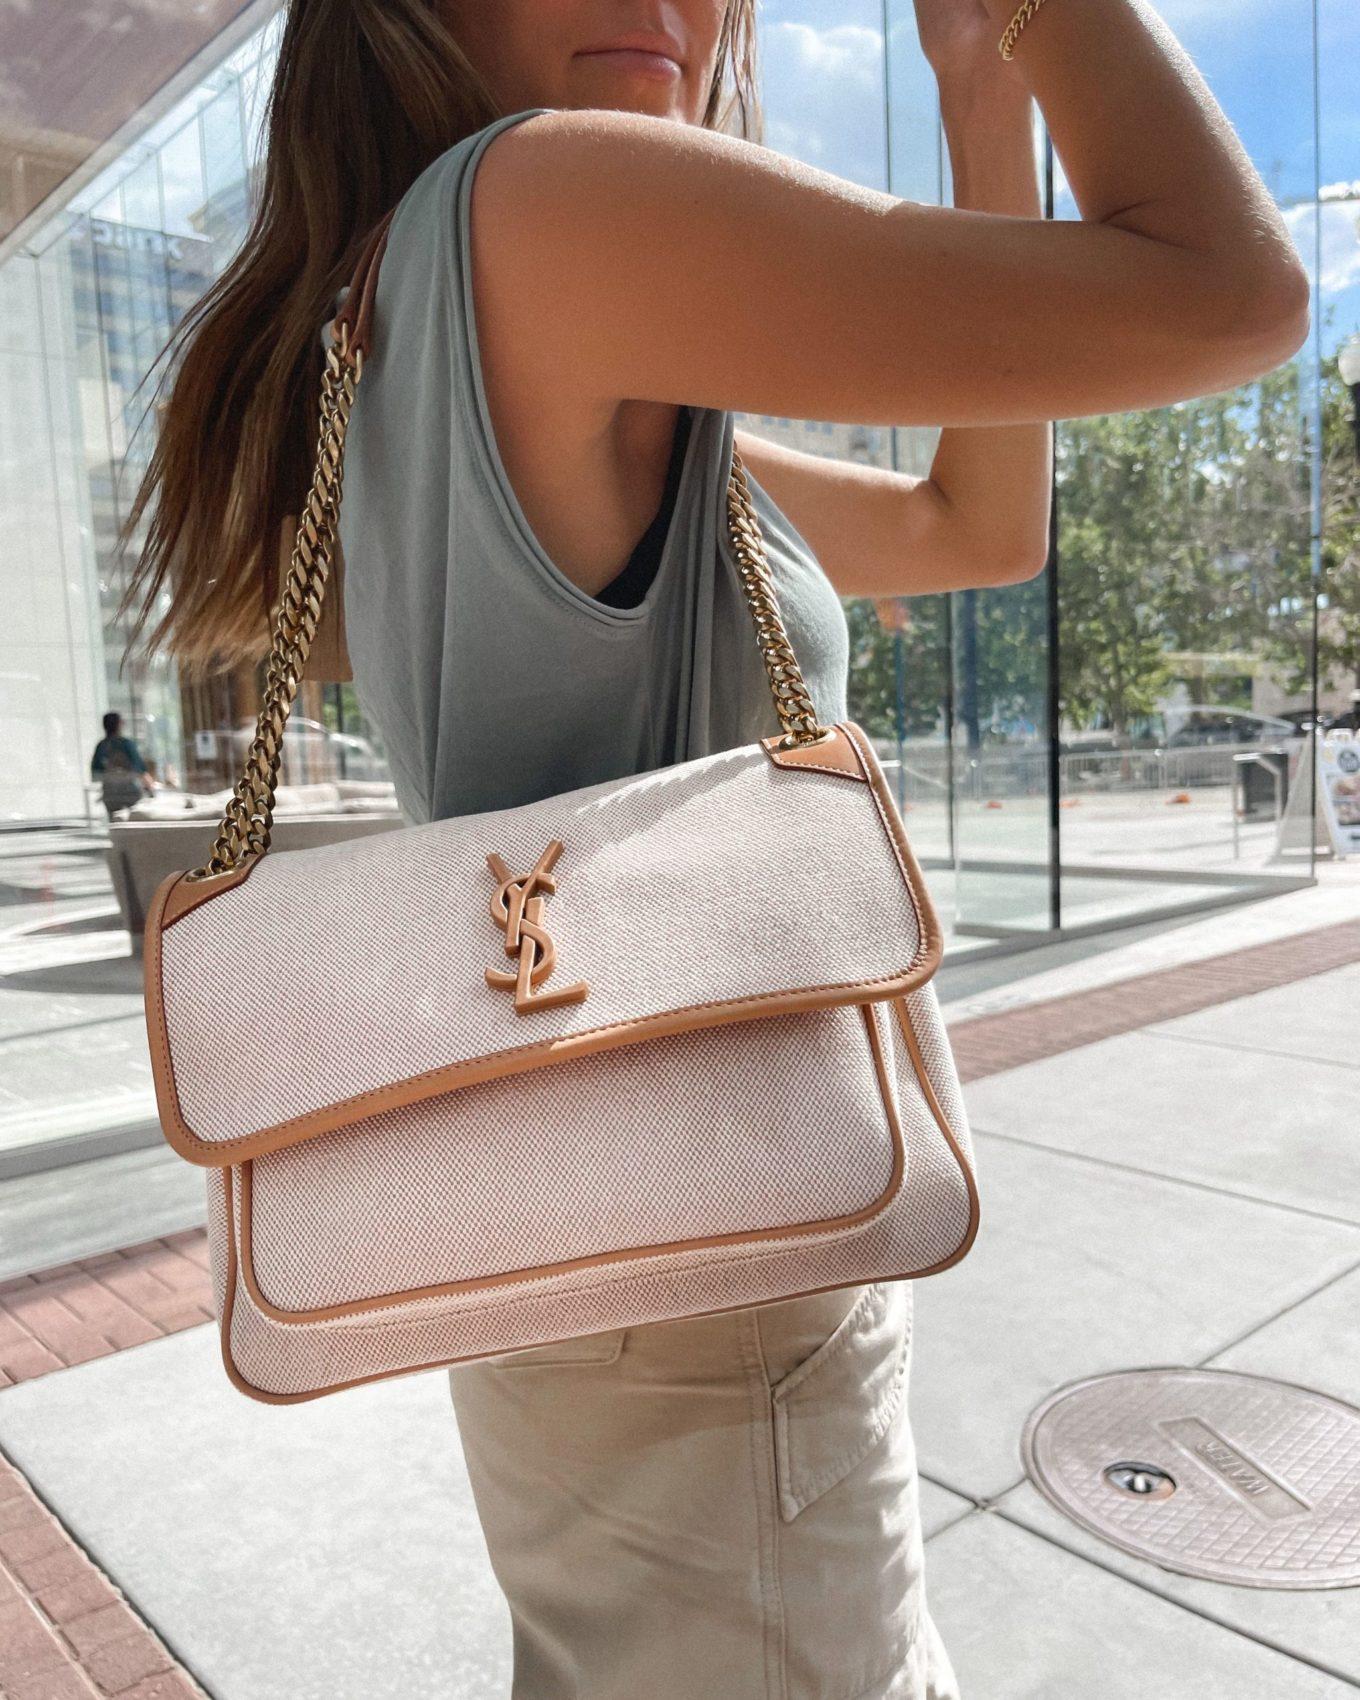 ysl handbags